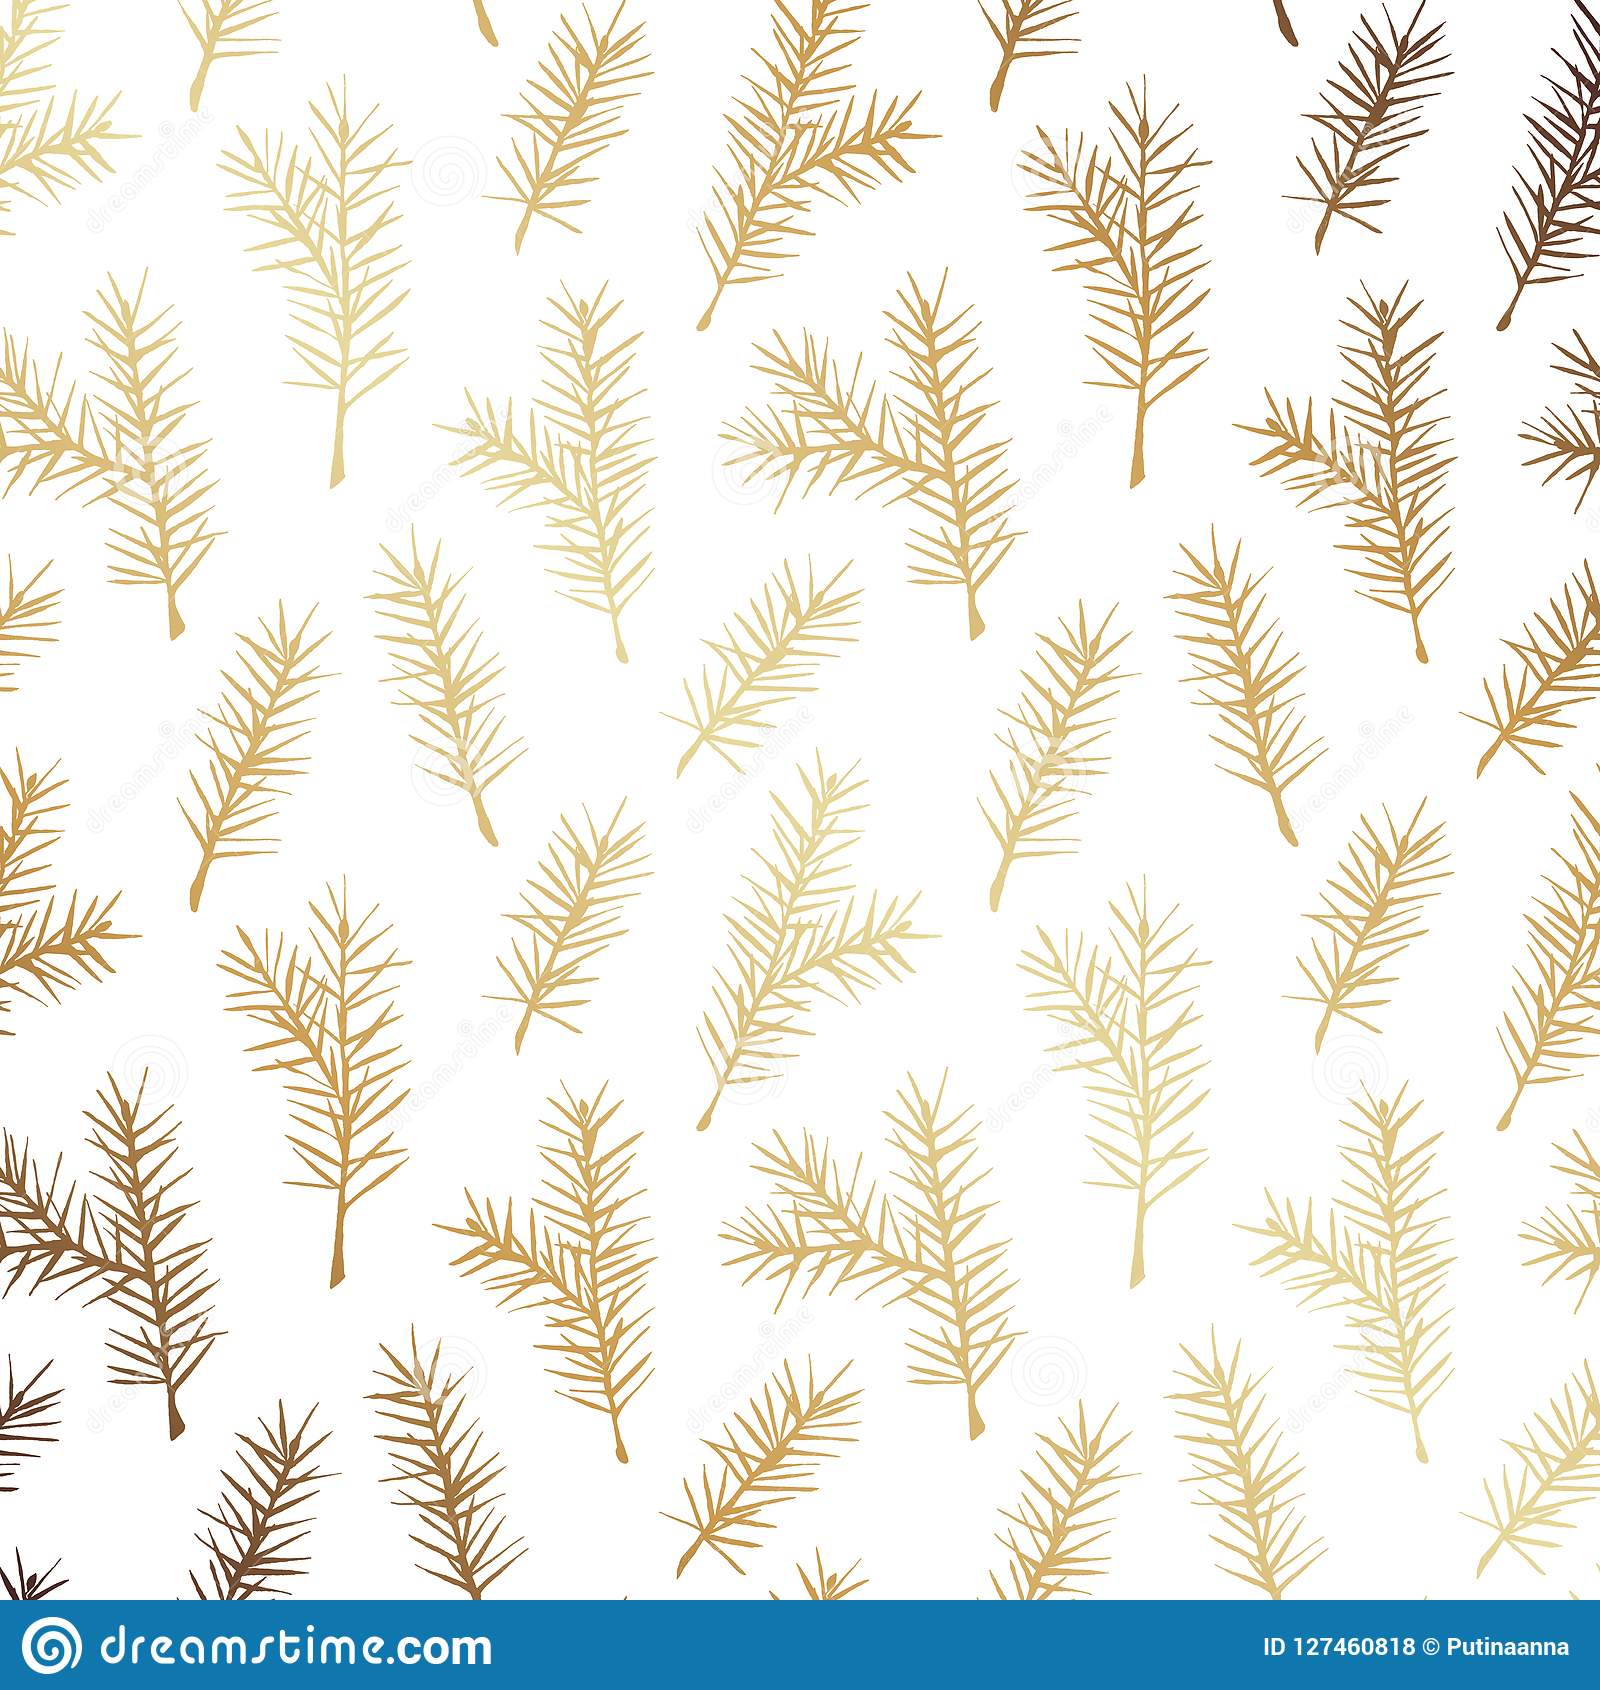 Christmas Greenery Vector.Rustic Hand Drawn Gold Fir Tree Vector Seamless Pattern